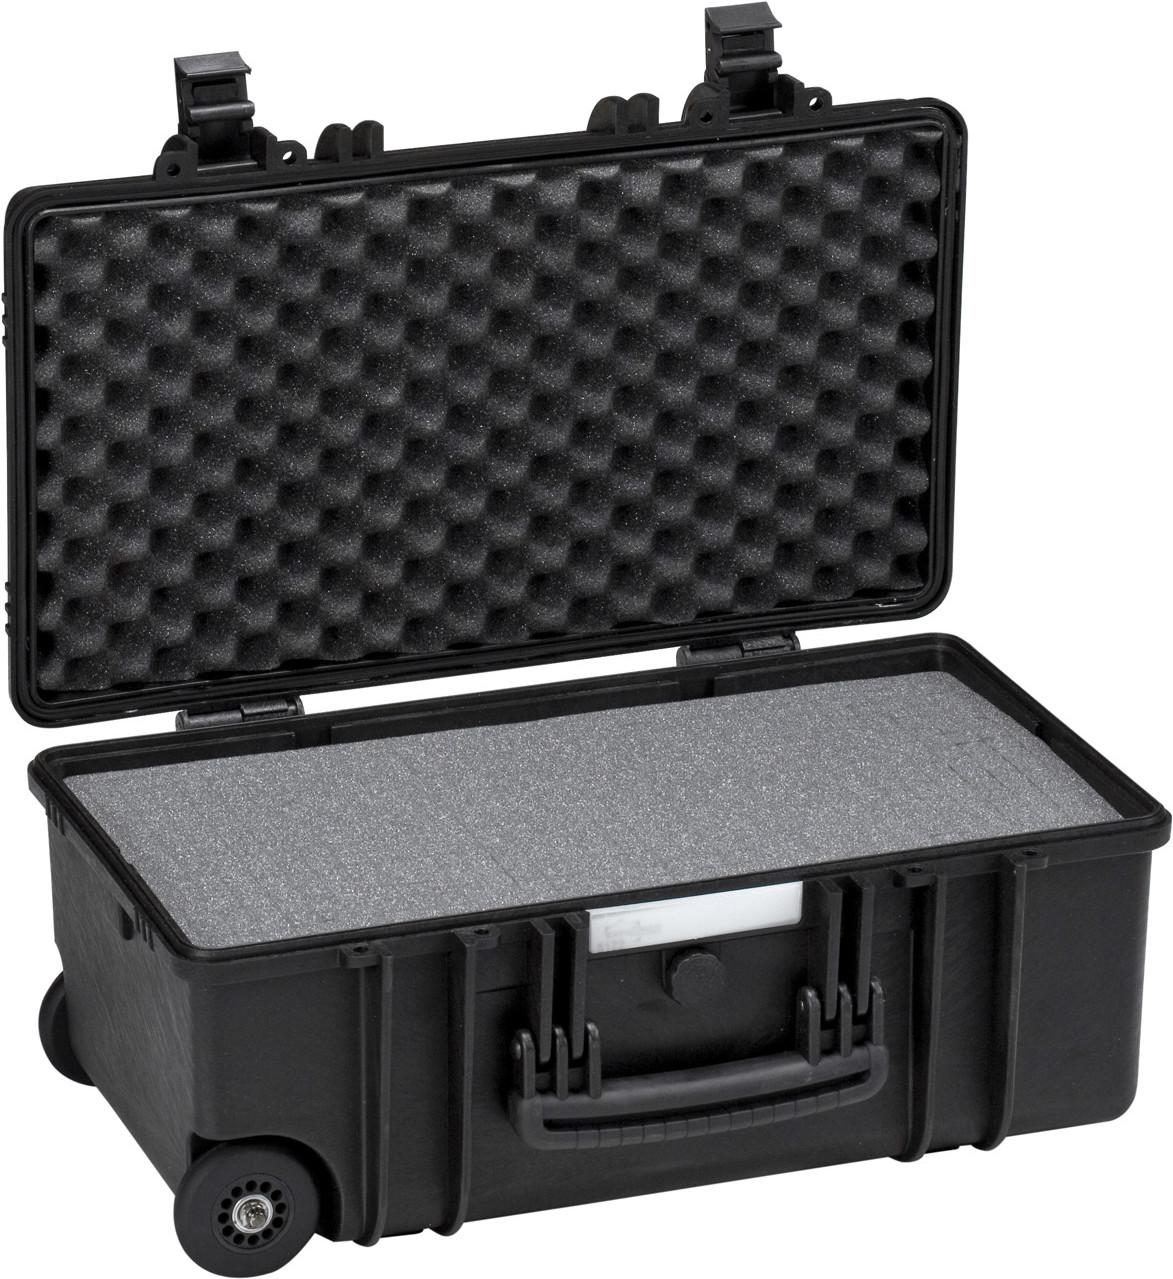 Image of Explorer Cases 5122 B